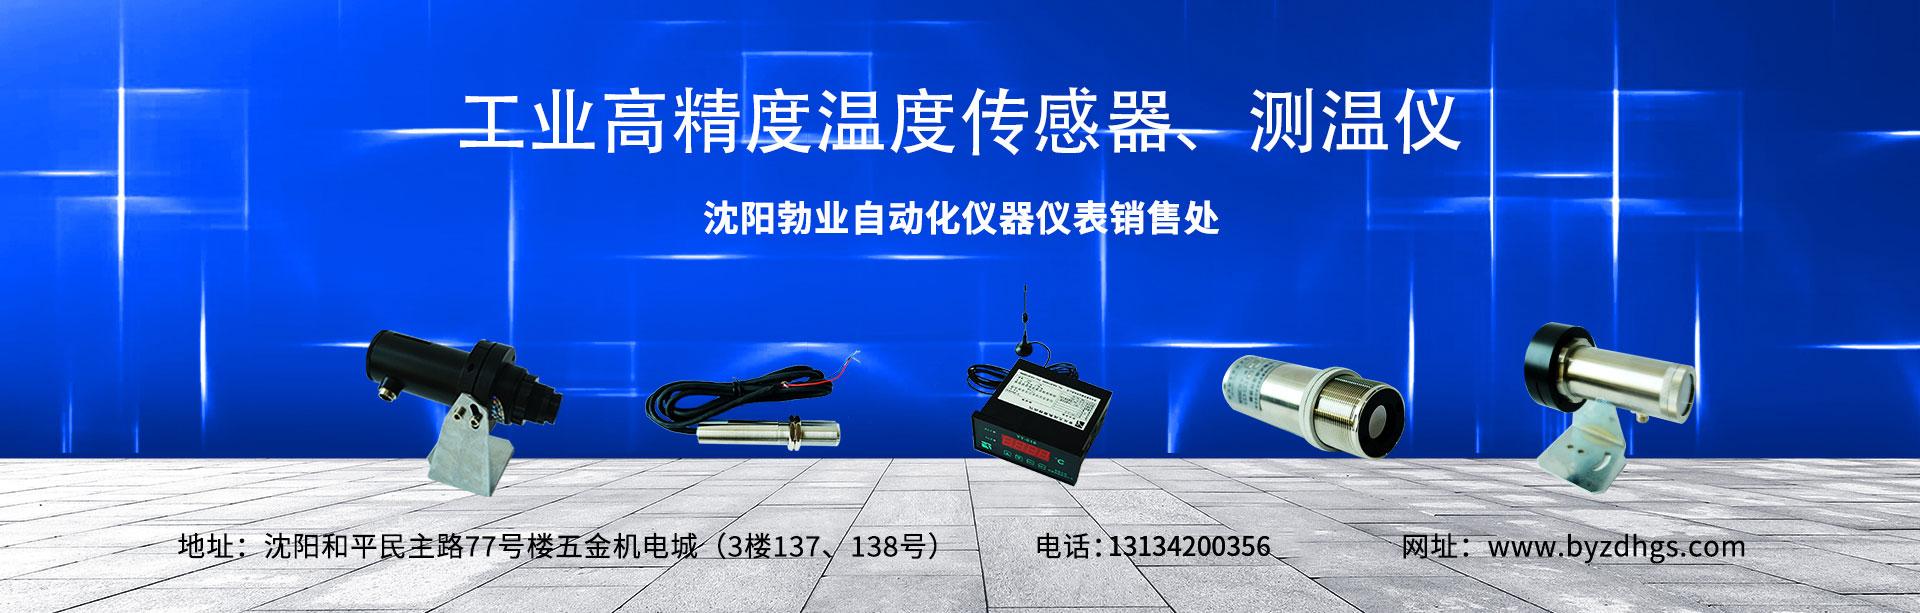 http://www.byzdhgs.com/product-1043.html